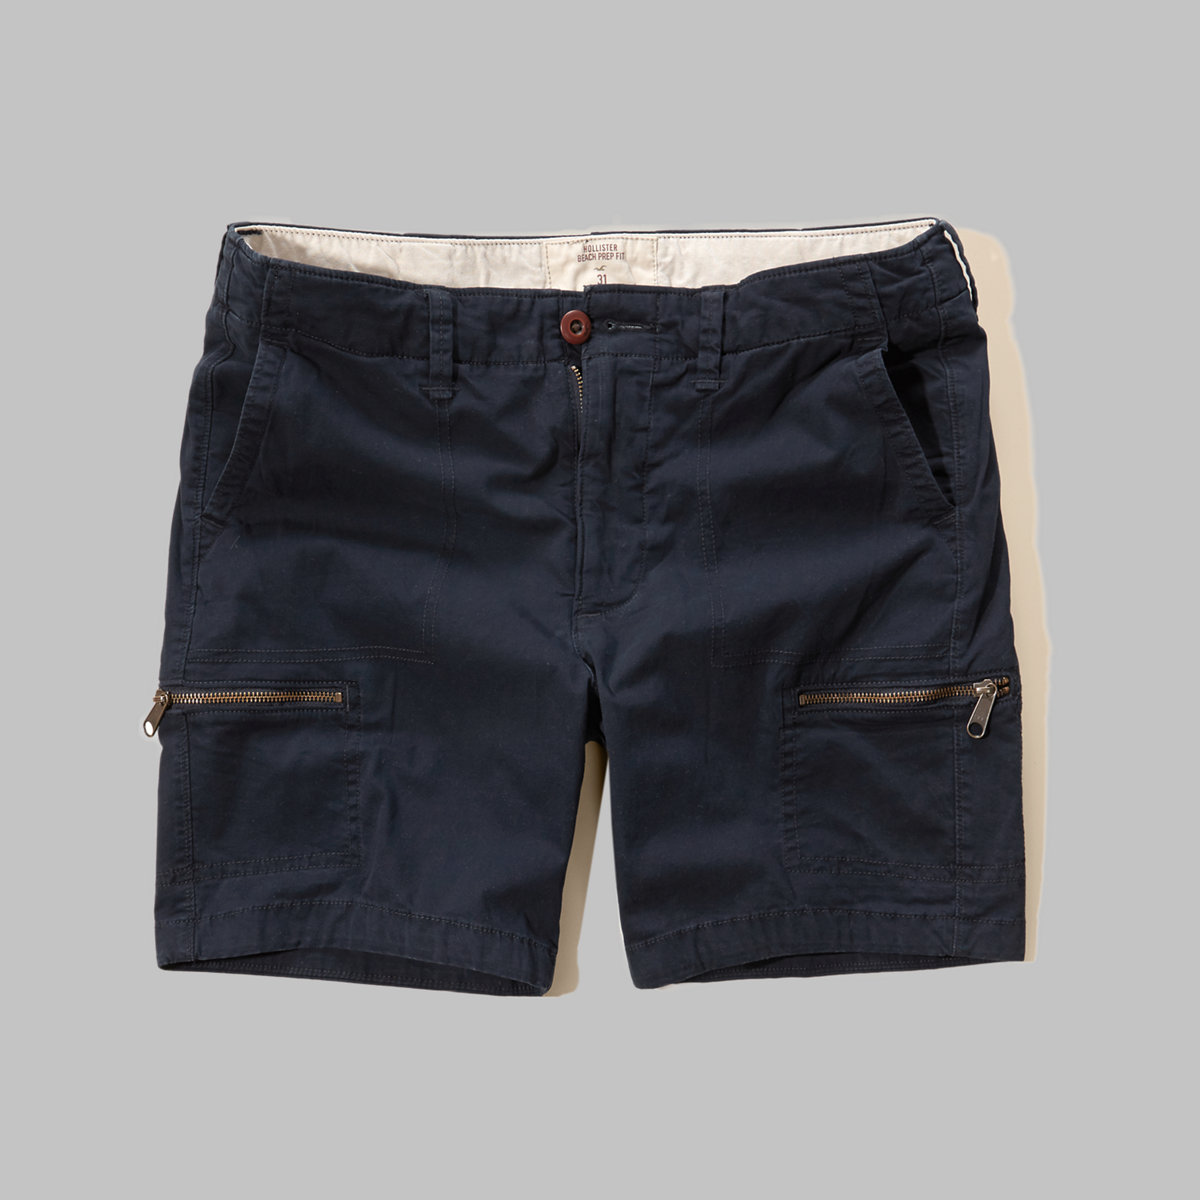 Hollister Beach Prep Fit Utility Shorts